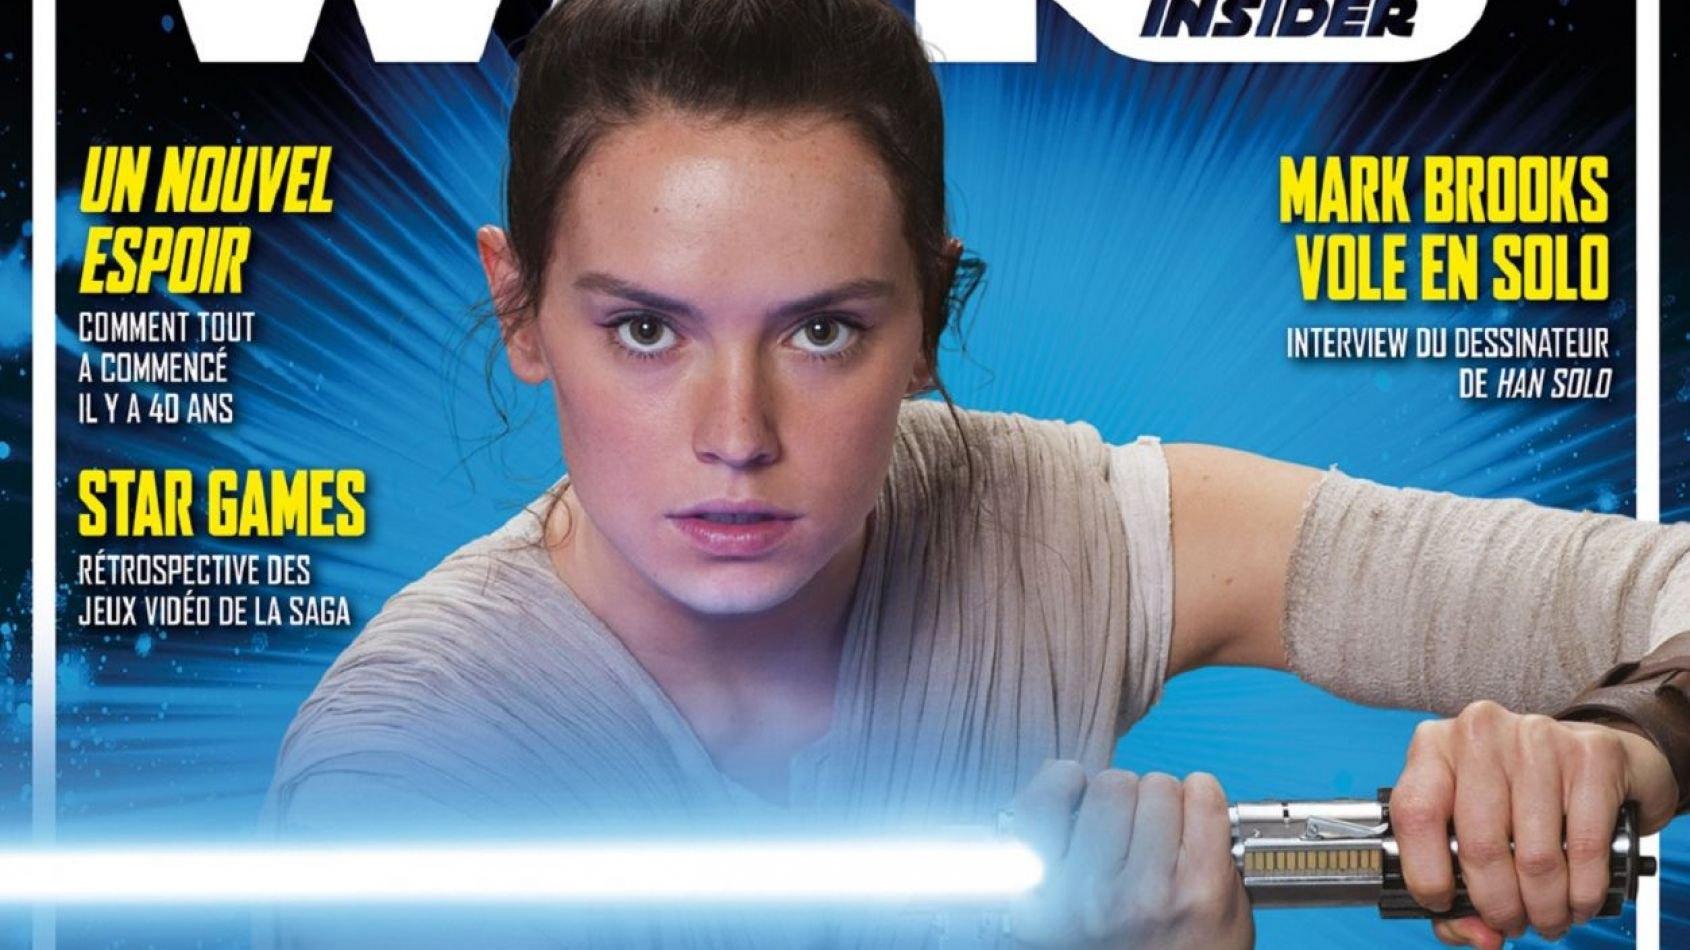 Panini : Sortie de Star Wars Insider 10